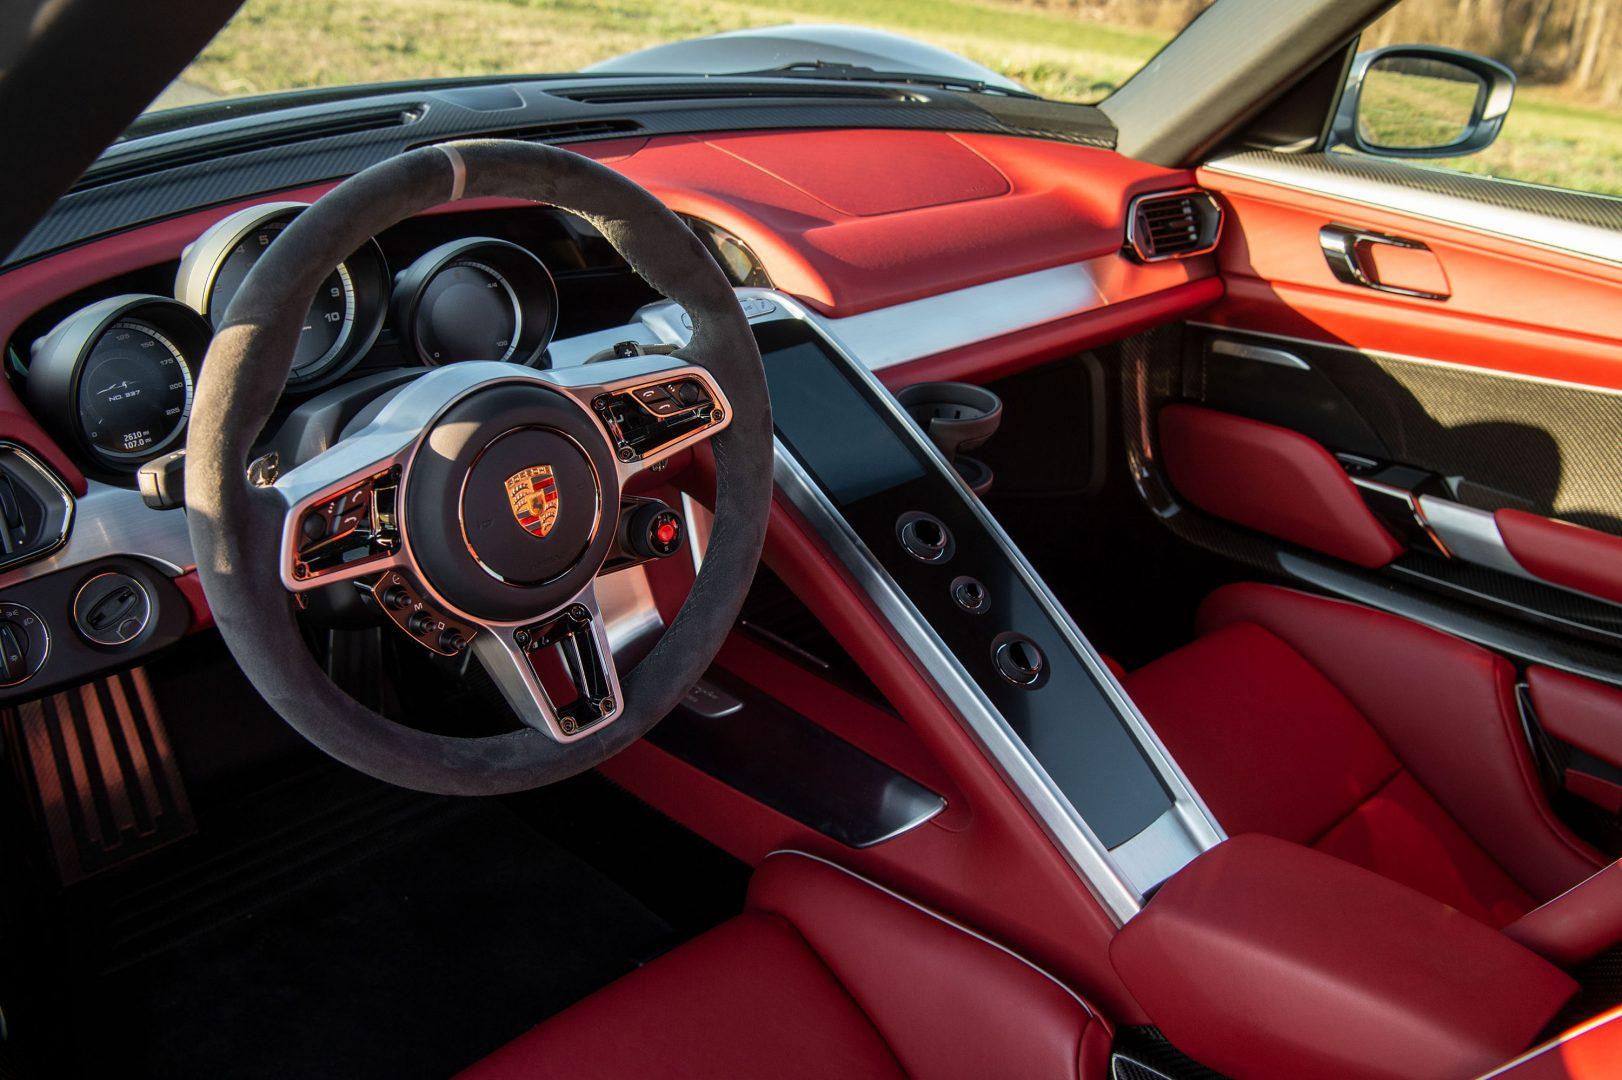 Silver Porsche 918 Spyder red cockpit leather interior; Lease a Porsche with Premier